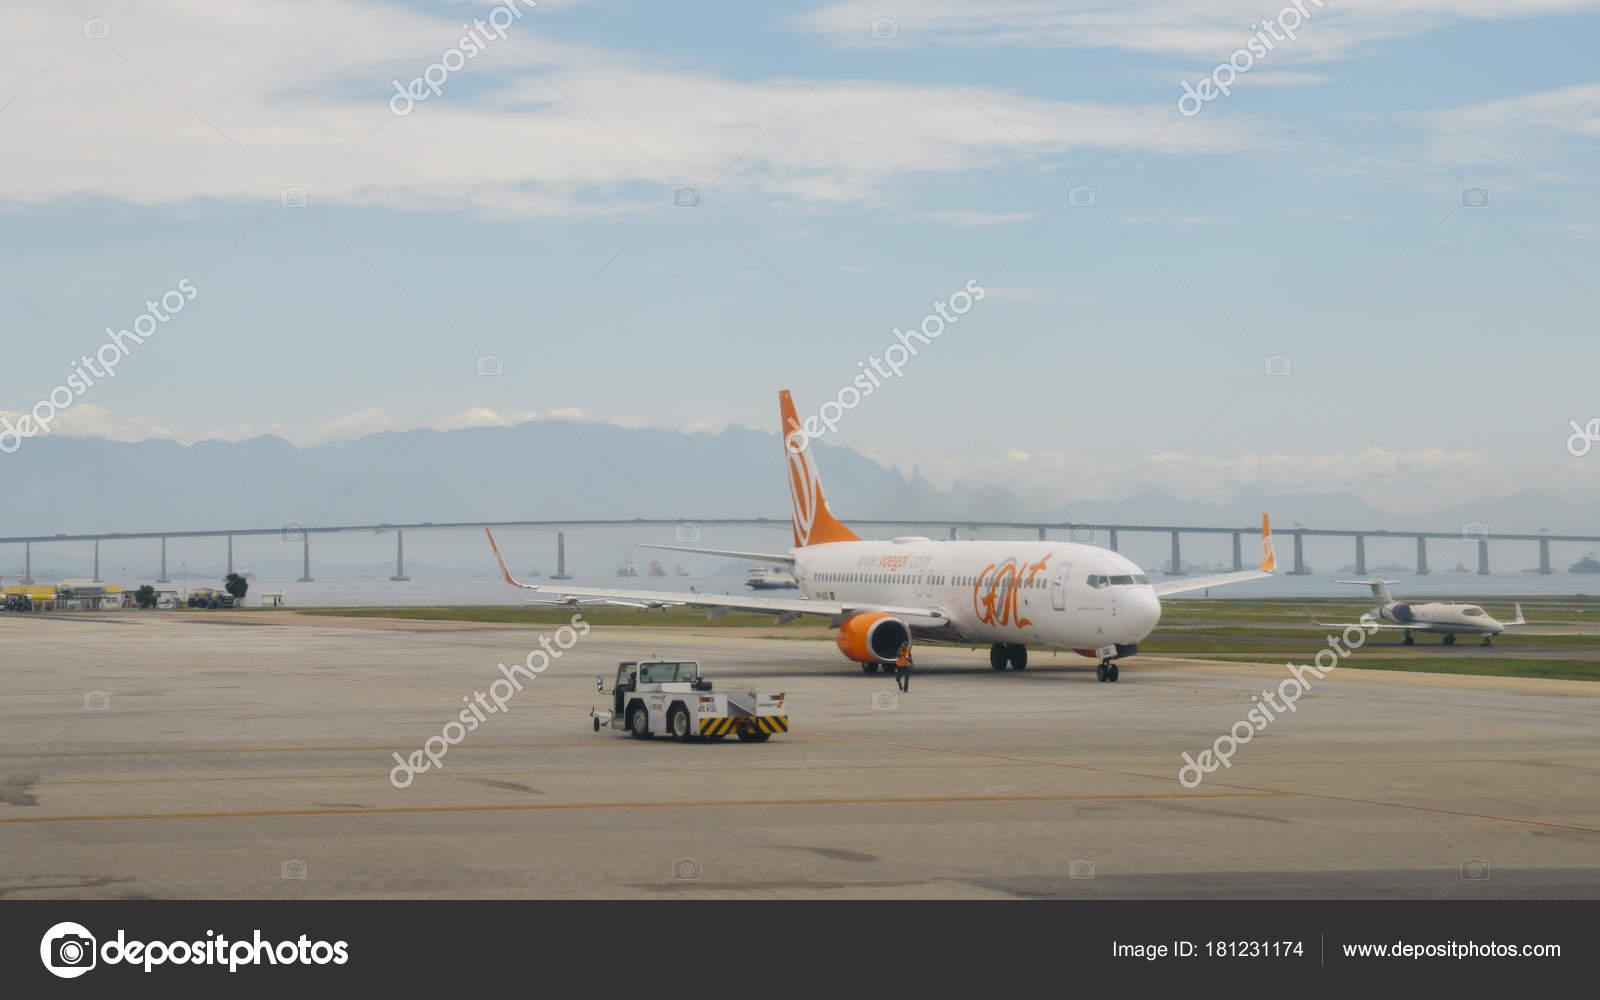 Aeroporto Do : Vem aí o maior aeroporto do mundo só podia ser na china